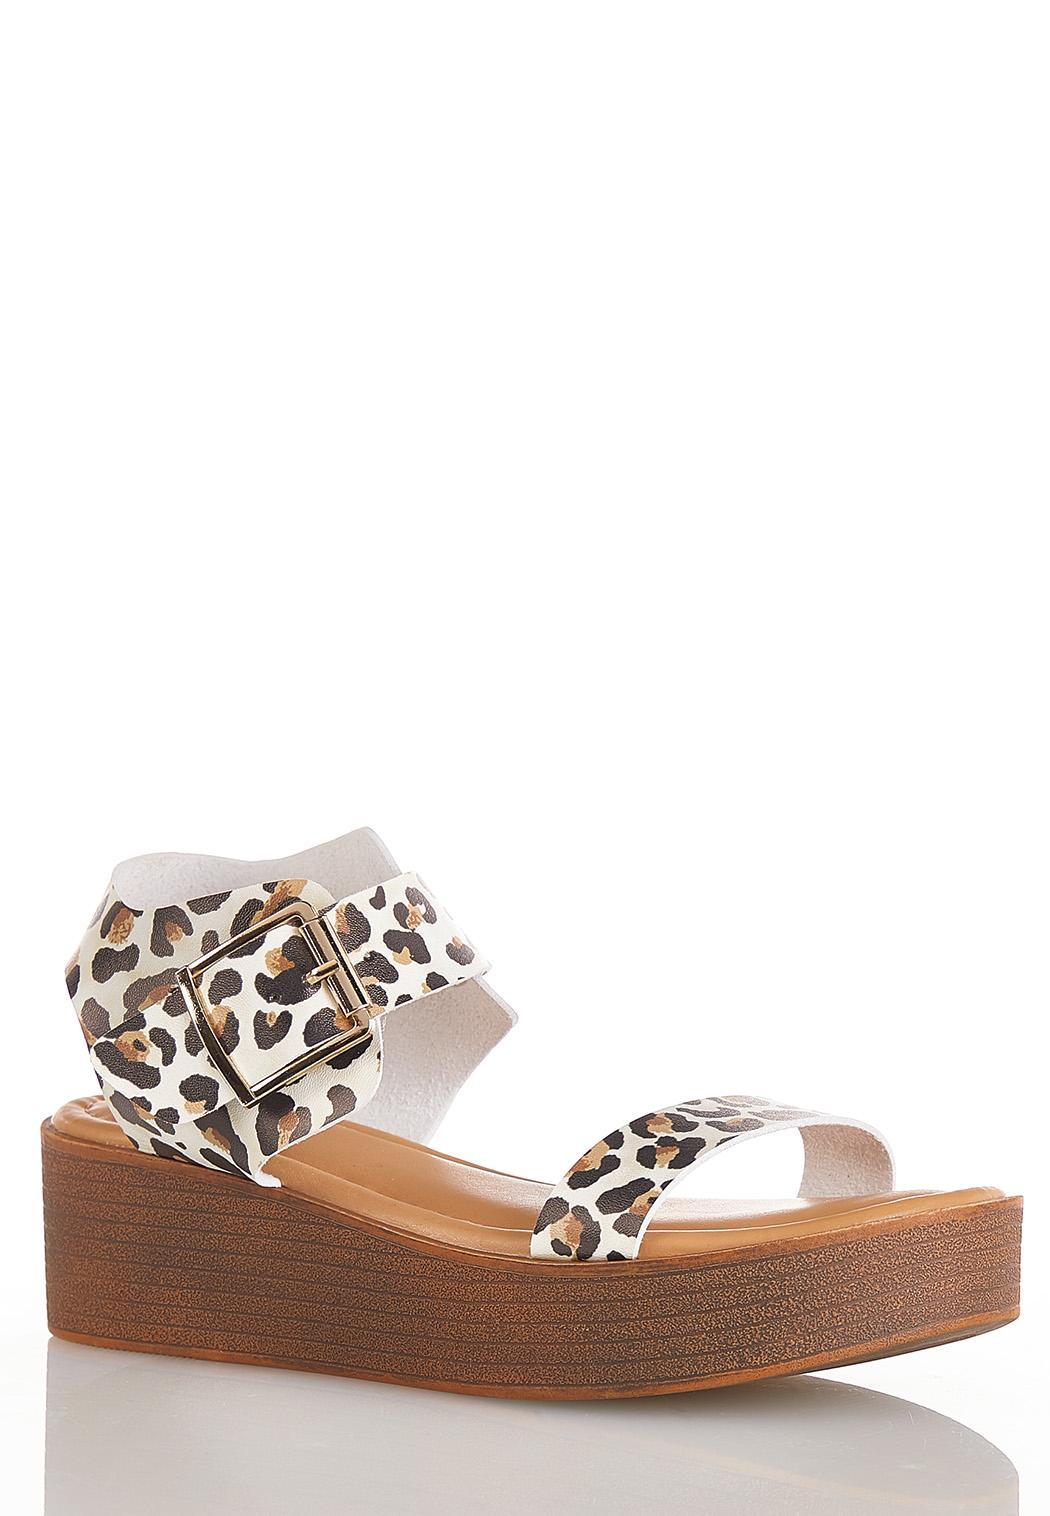 Leopard Flatform Sandals